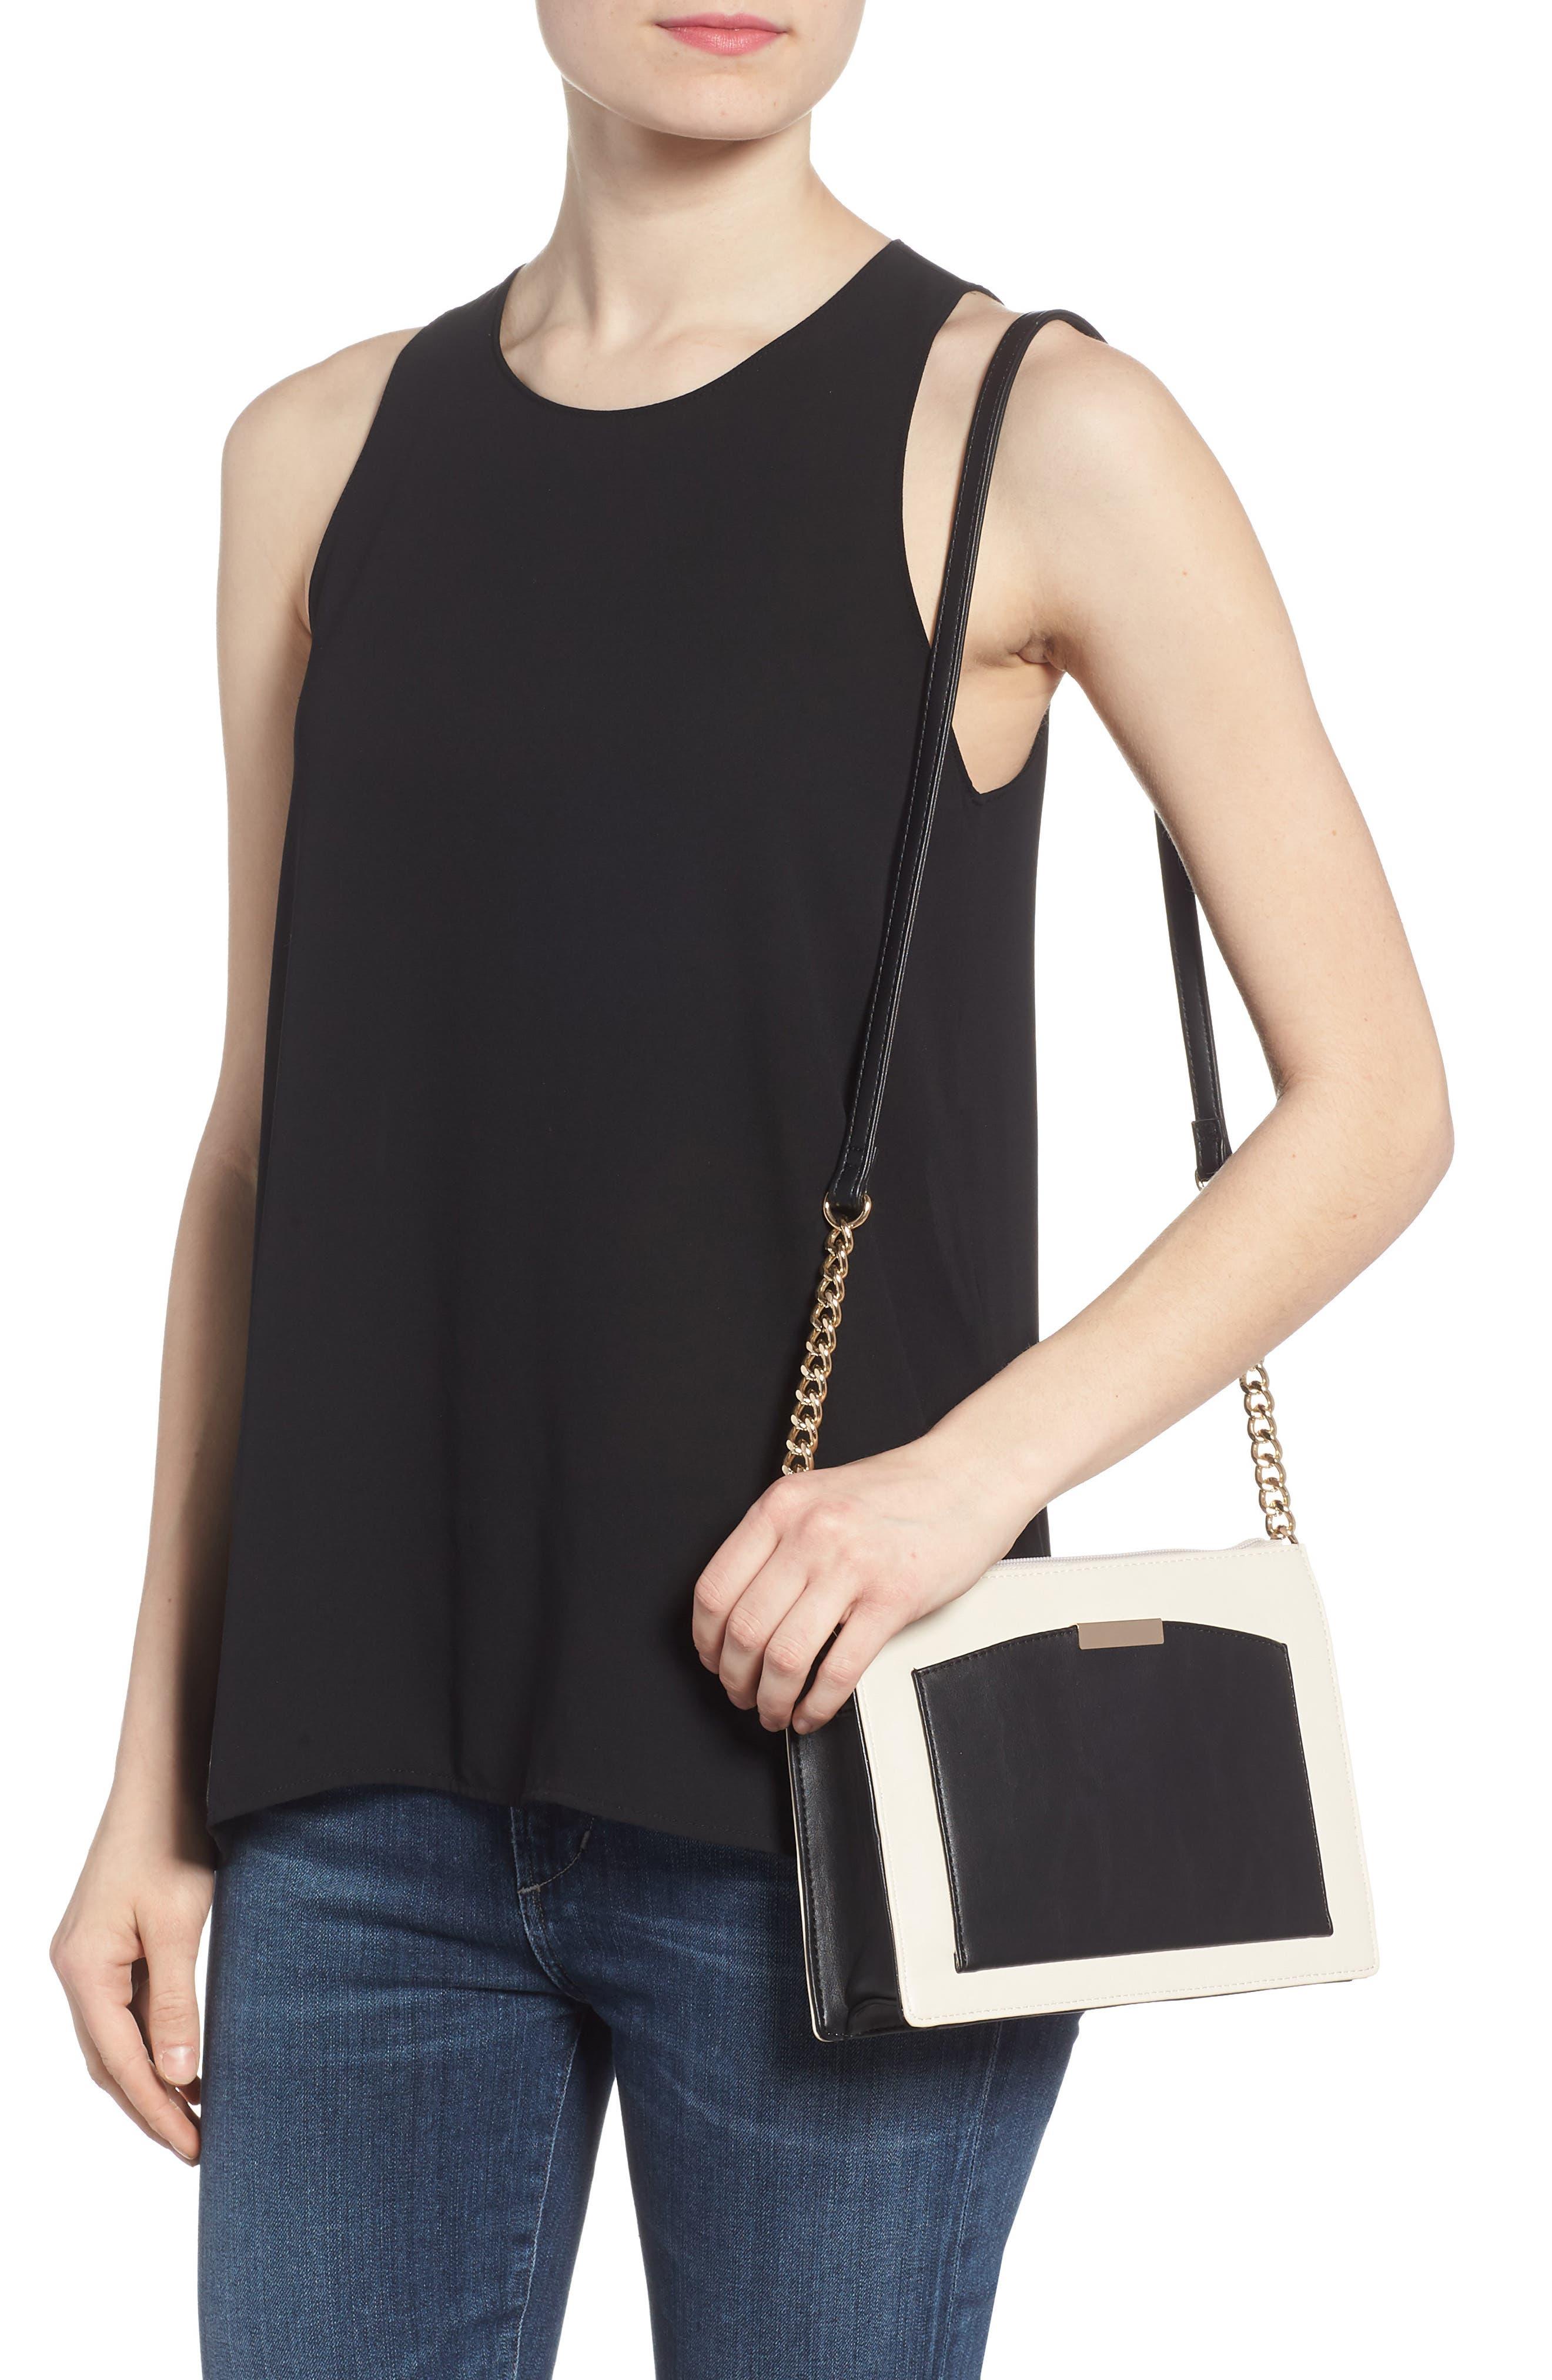 Colorblock Faux Leather Crossbody Bag,                             Alternate thumbnail 2, color,                             Ivory/ Black